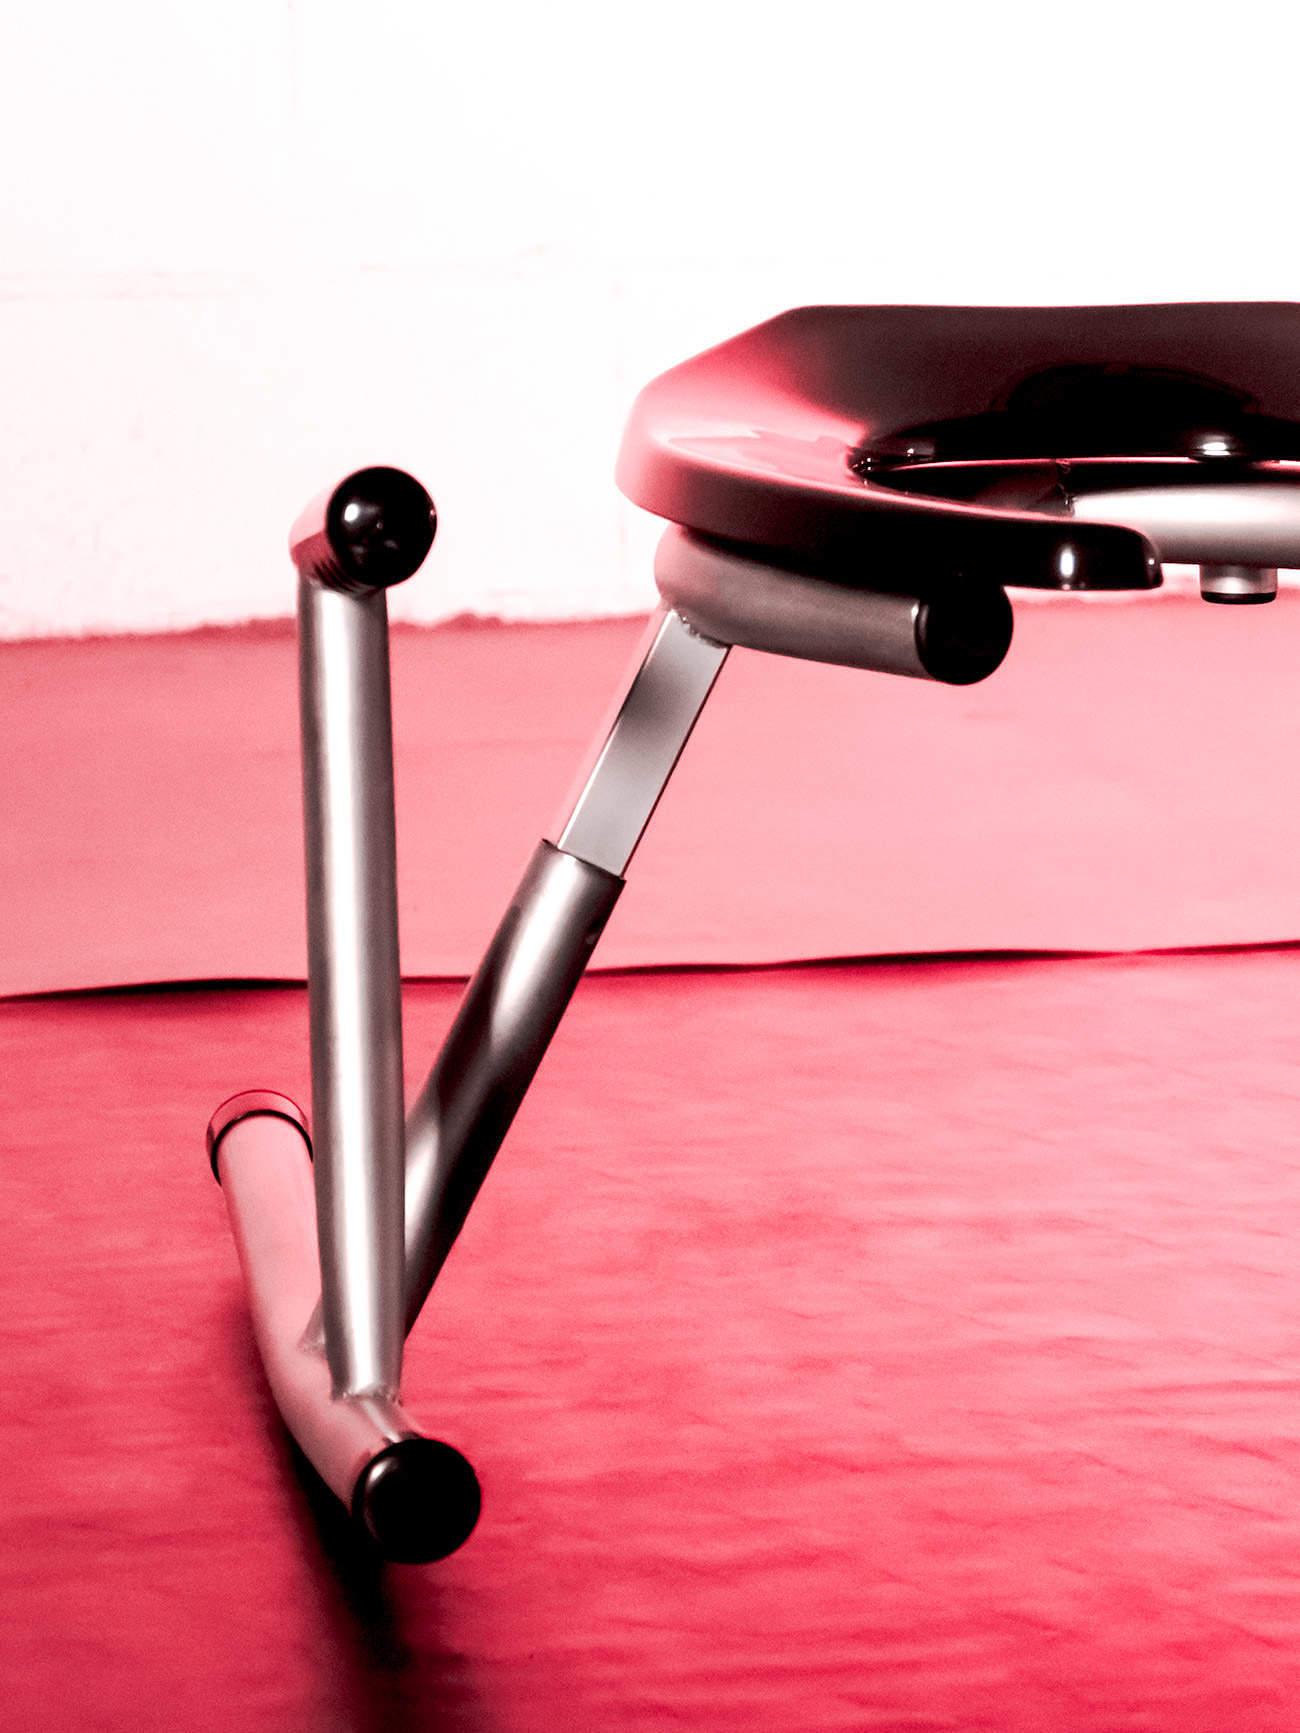 JimSupport Rim Rocker Rim Seat Handle Detail